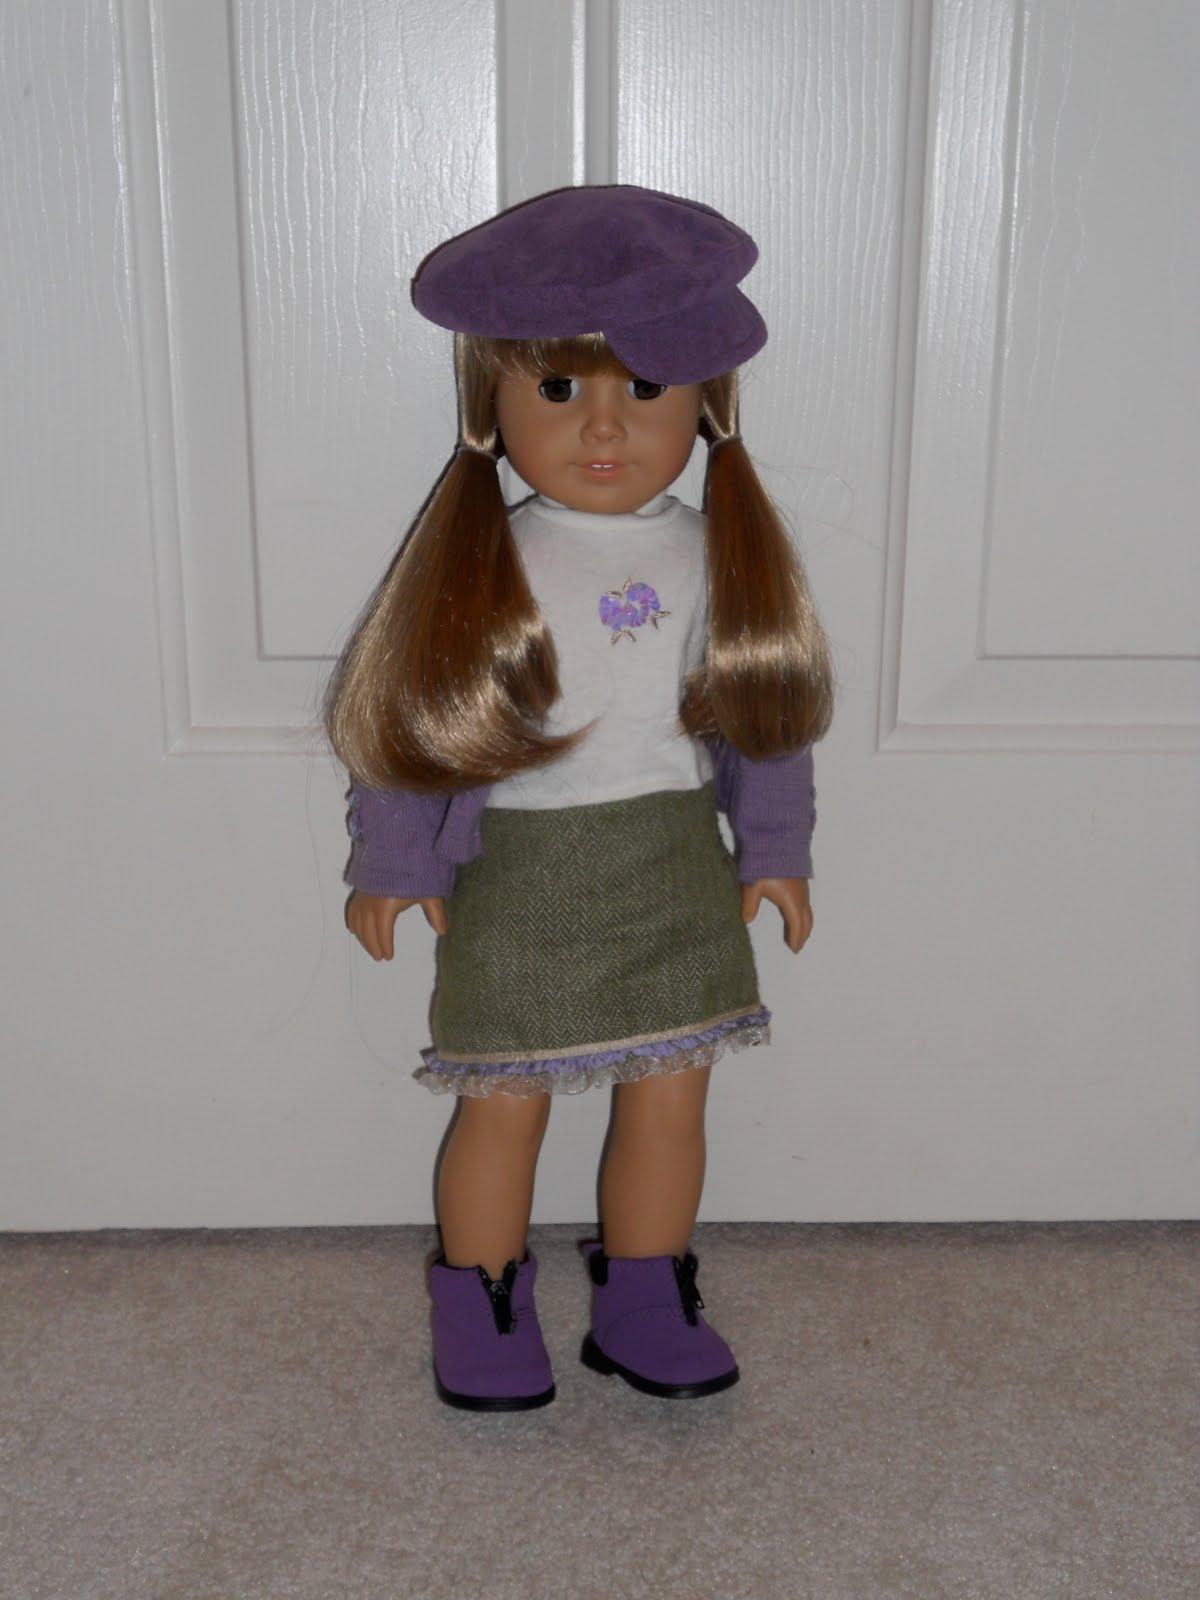 american girl doll sale the dolls. Black Bedroom Furniture Sets. Home Design Ideas